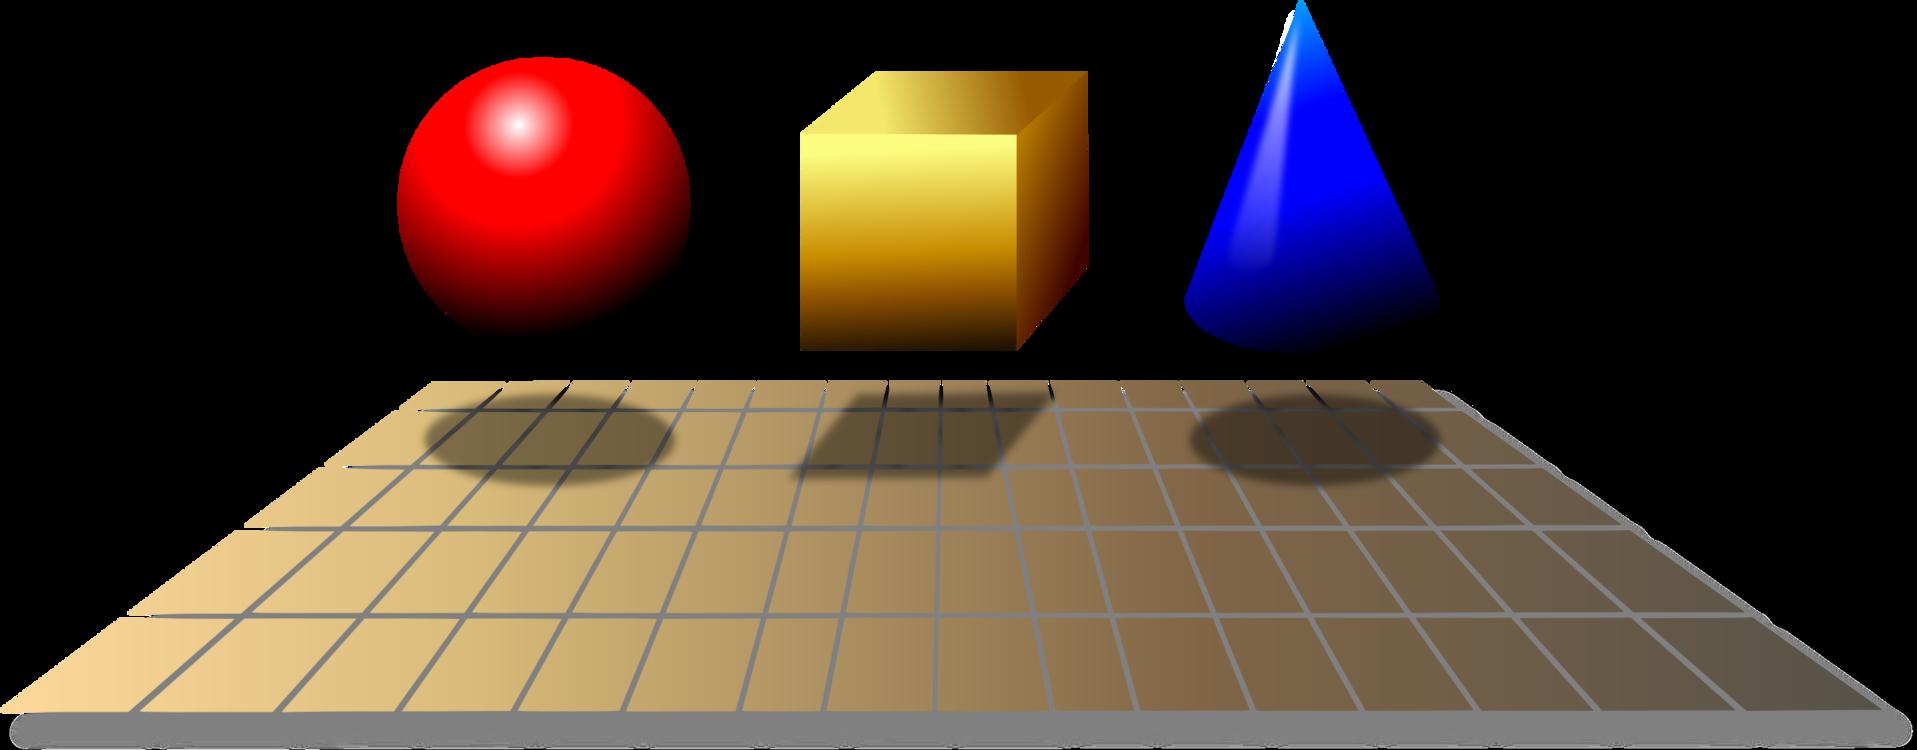 Square,Angle,Flooring